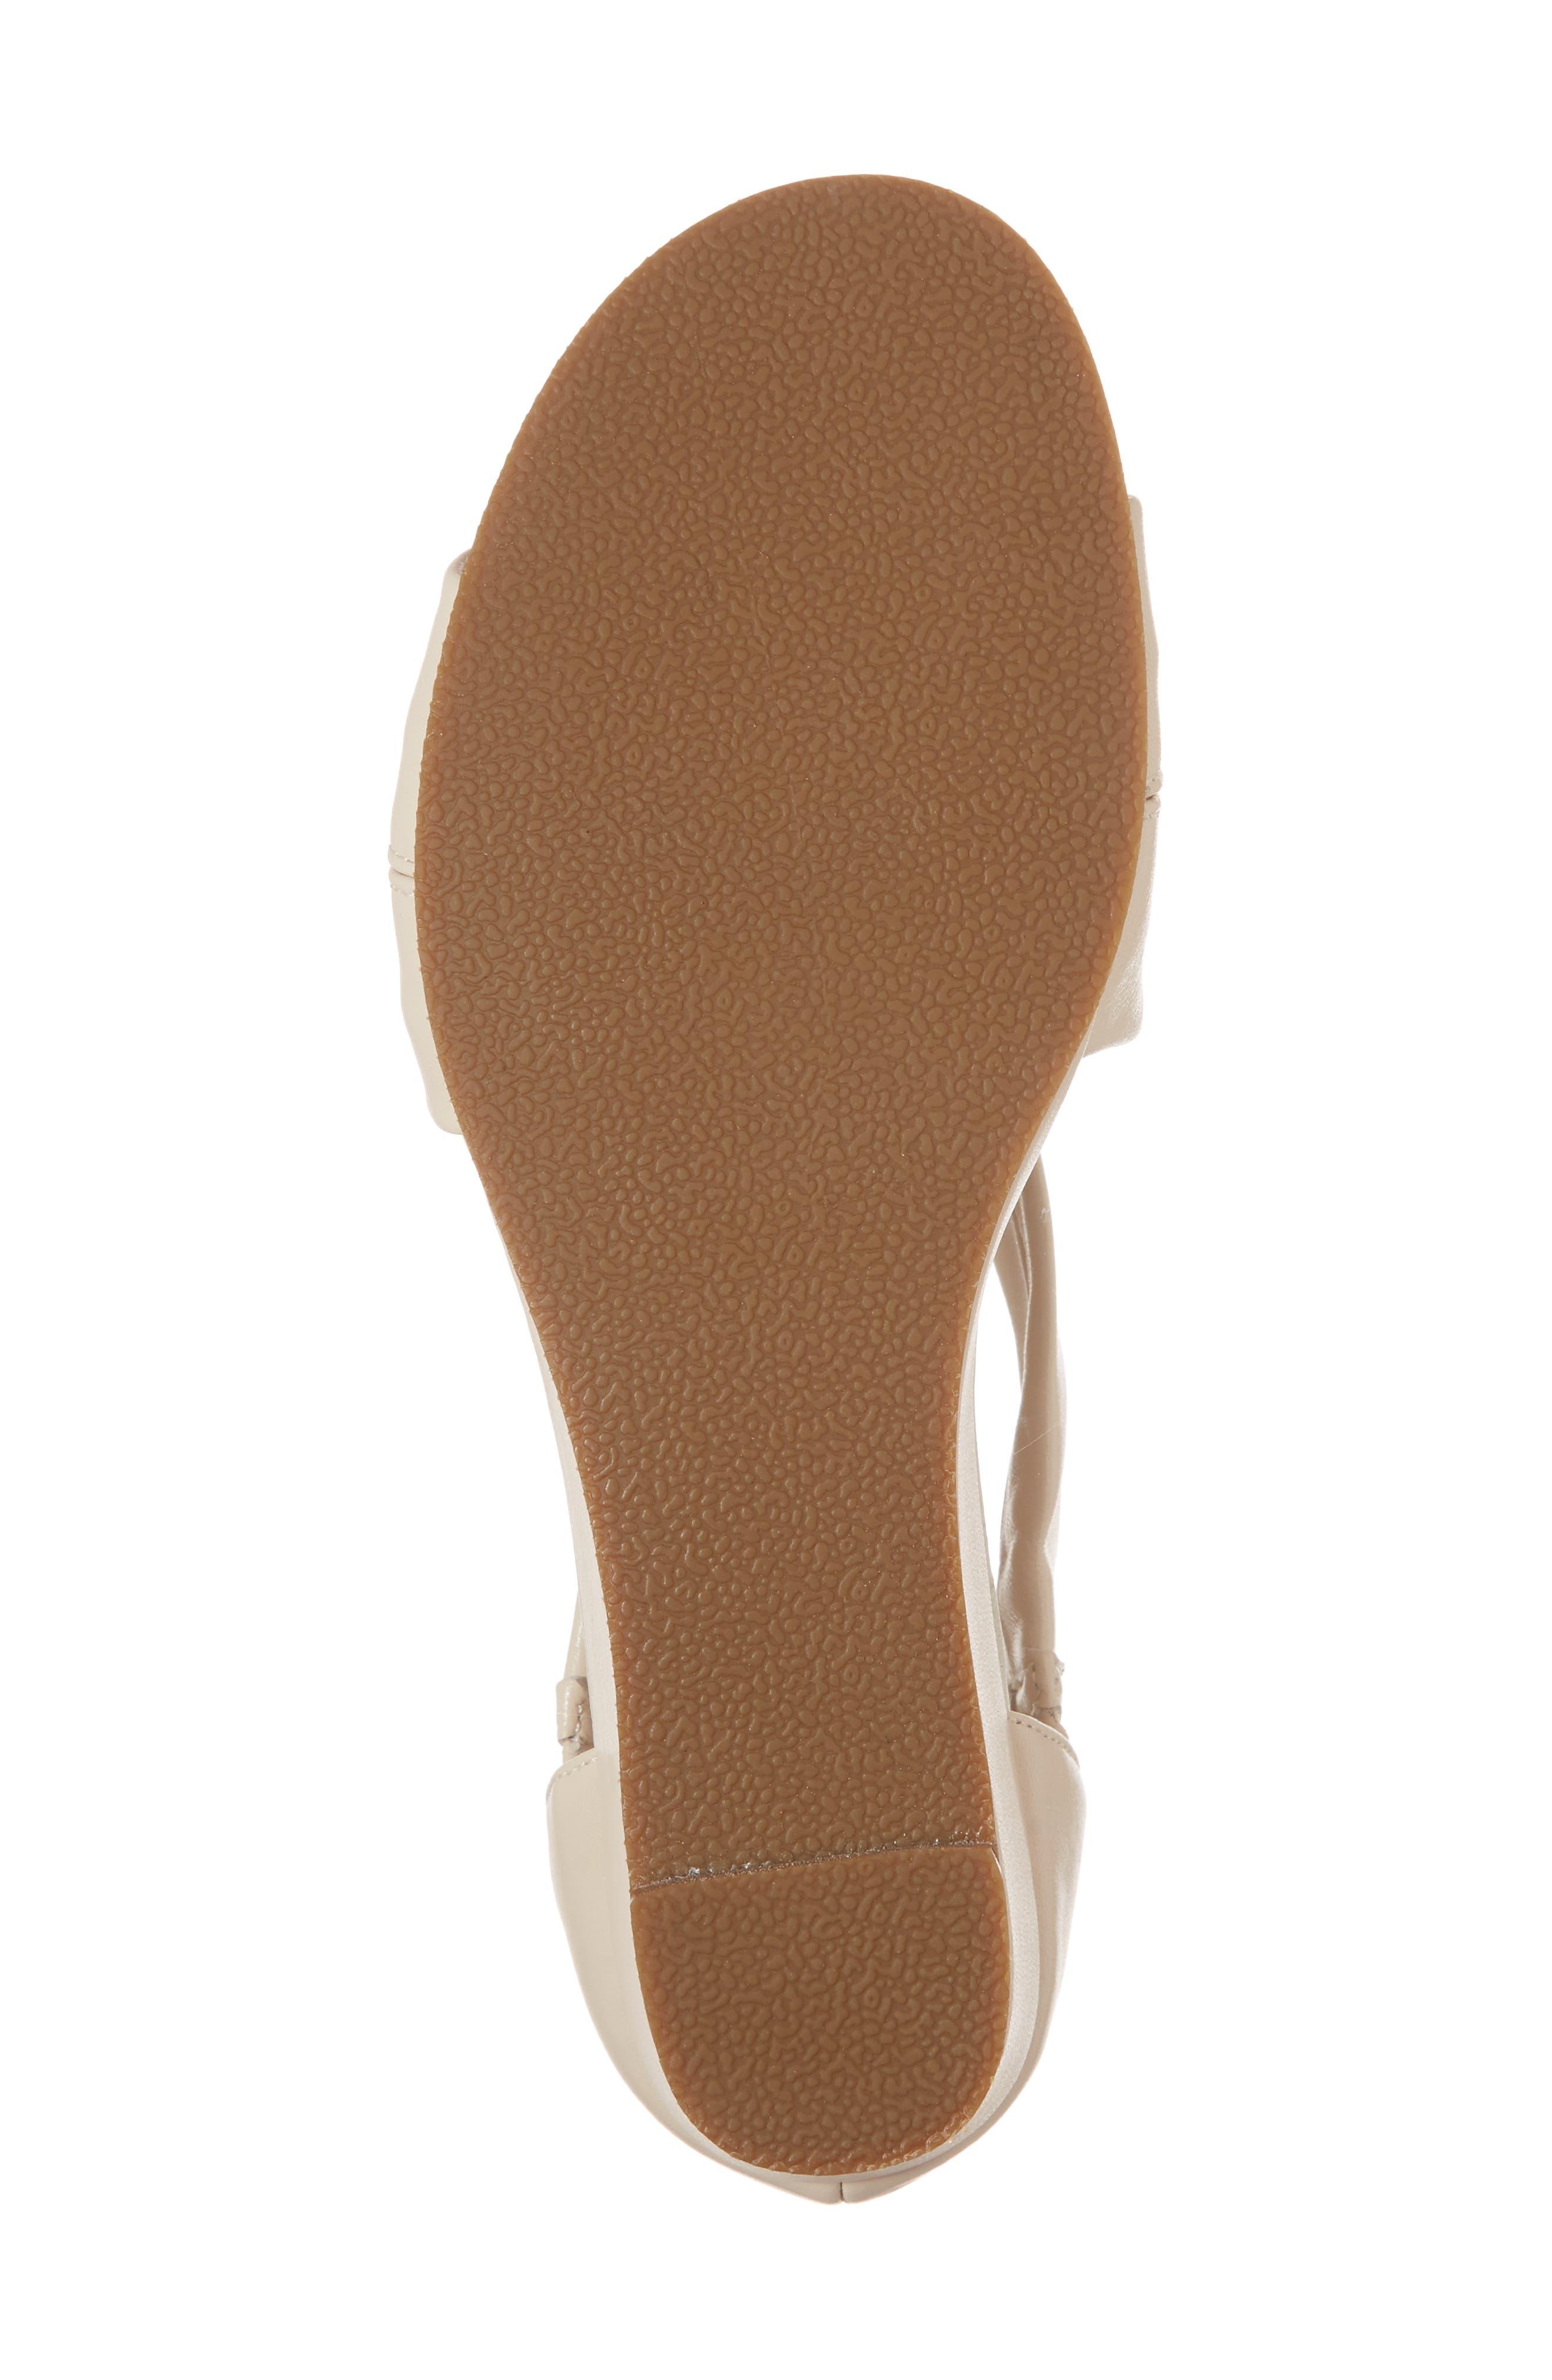 Swell Cross Strap Wedge Sandal,                             Alternate thumbnail 6, color,                             Bone Leather